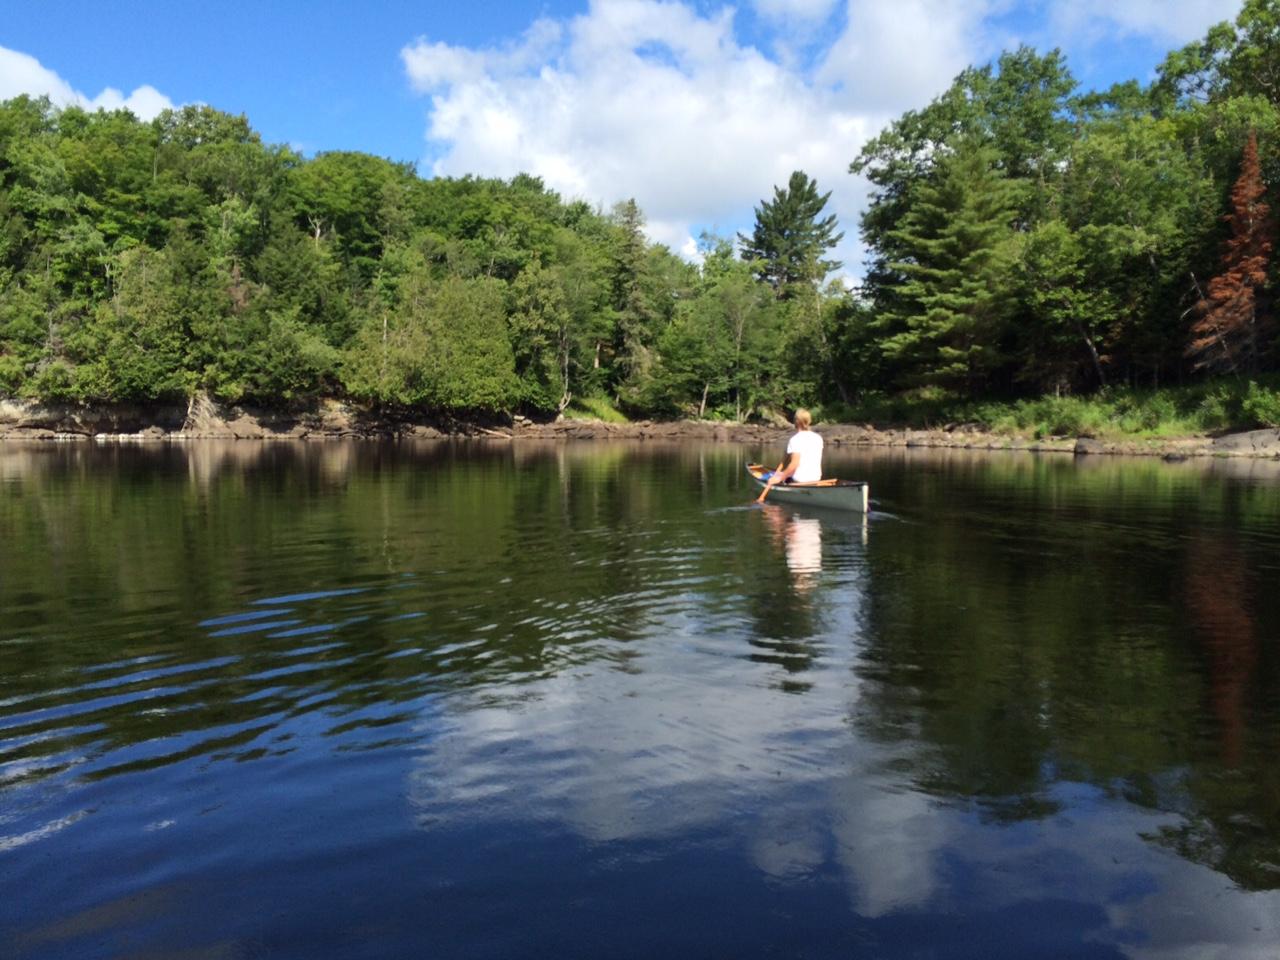 Rory paddling